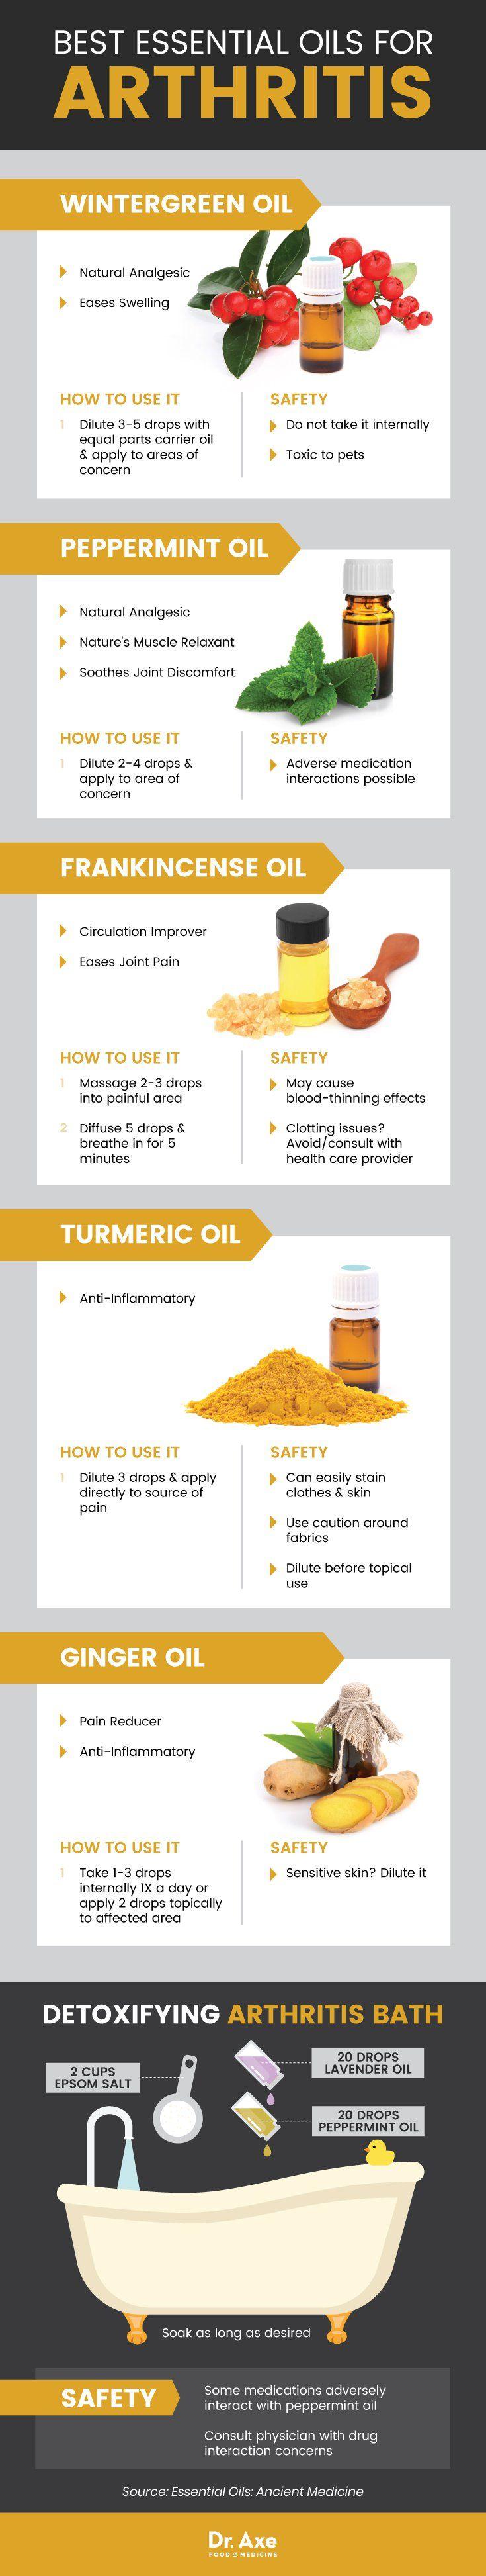 Best essential oils for arthritis  - Dr. Axe